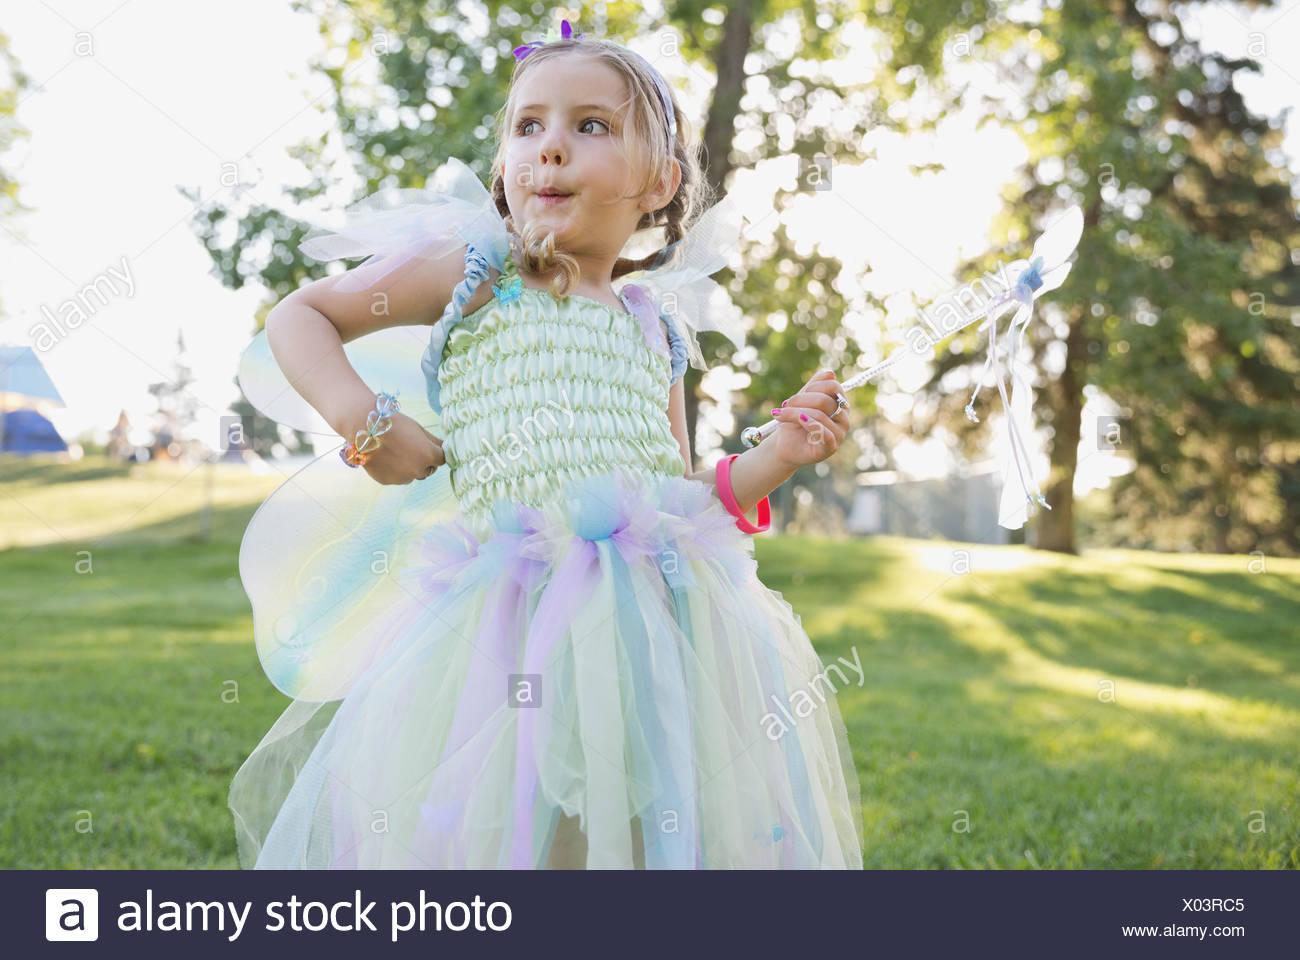 f6d3f78ac9f Fairy Costume Stock Photos & Fairy Costume Stock Images - Alamy